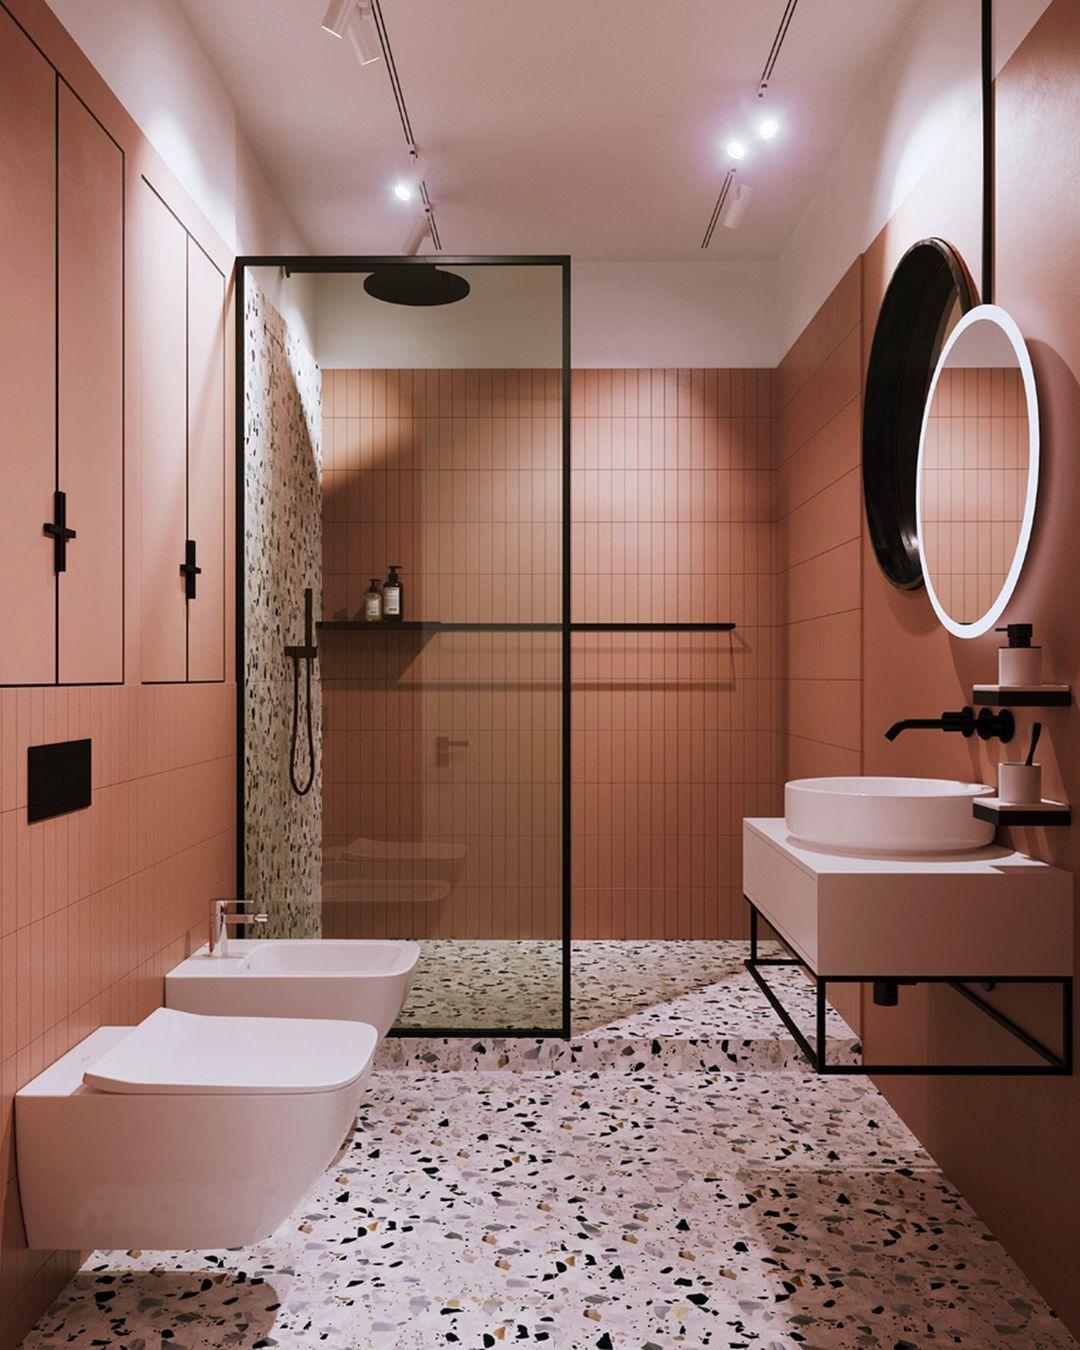 8 Awesome Bathroom Decor Ideas You Should Know In 2021 Bathroom Interior Design Bathroom Decor Diy Bathroom Decor